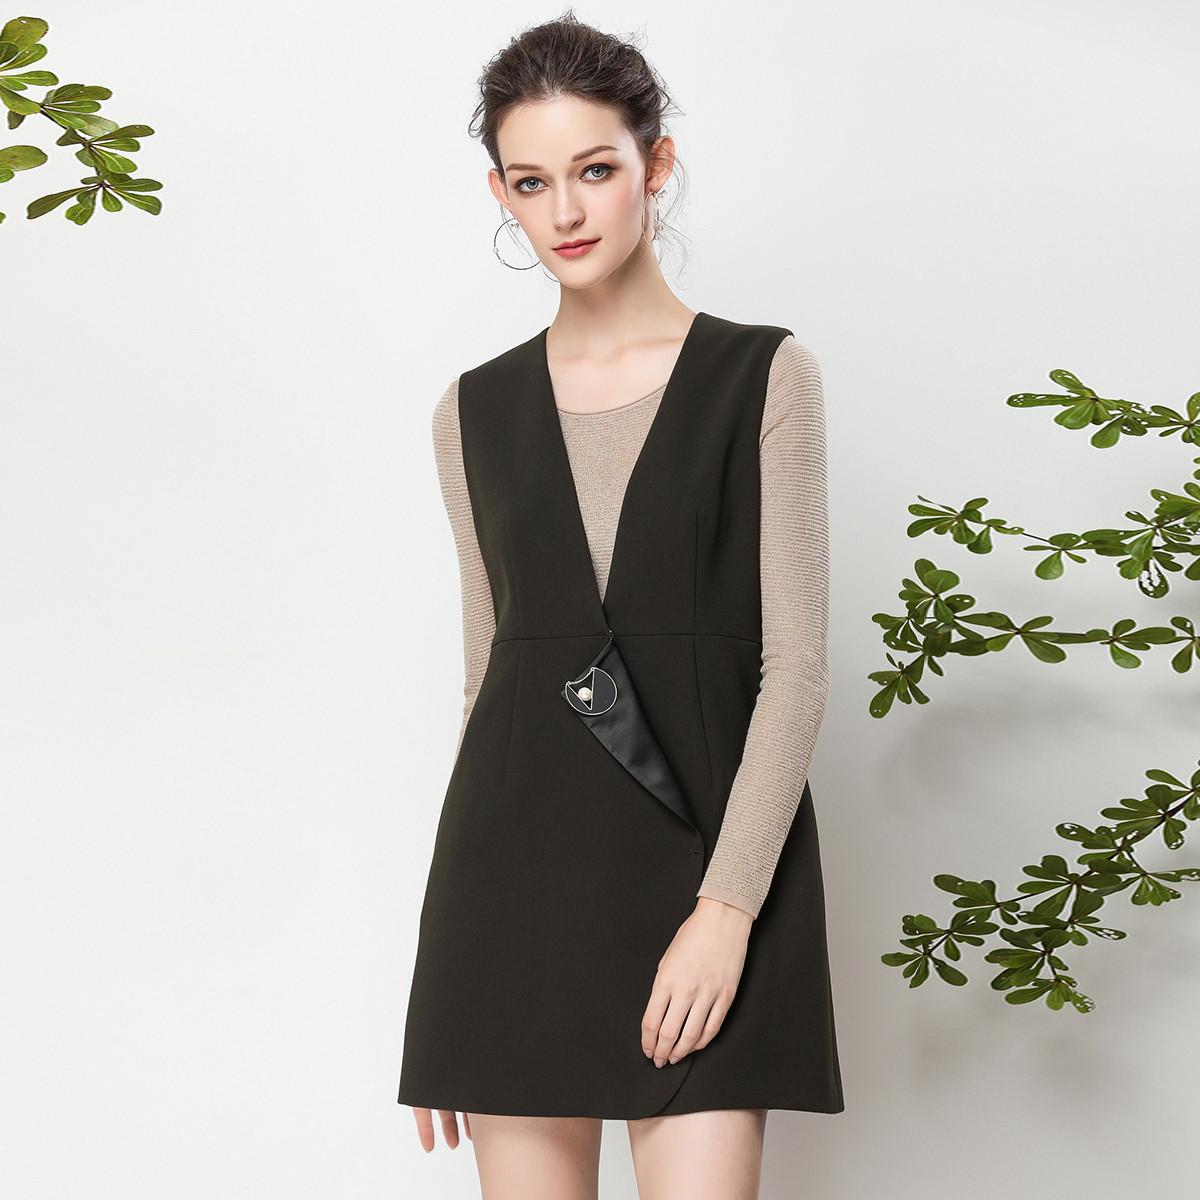 BUOUBUOUBUOUBUOU 秋冬新款时尚修身气质纯色外套马甲女BE1C010G48